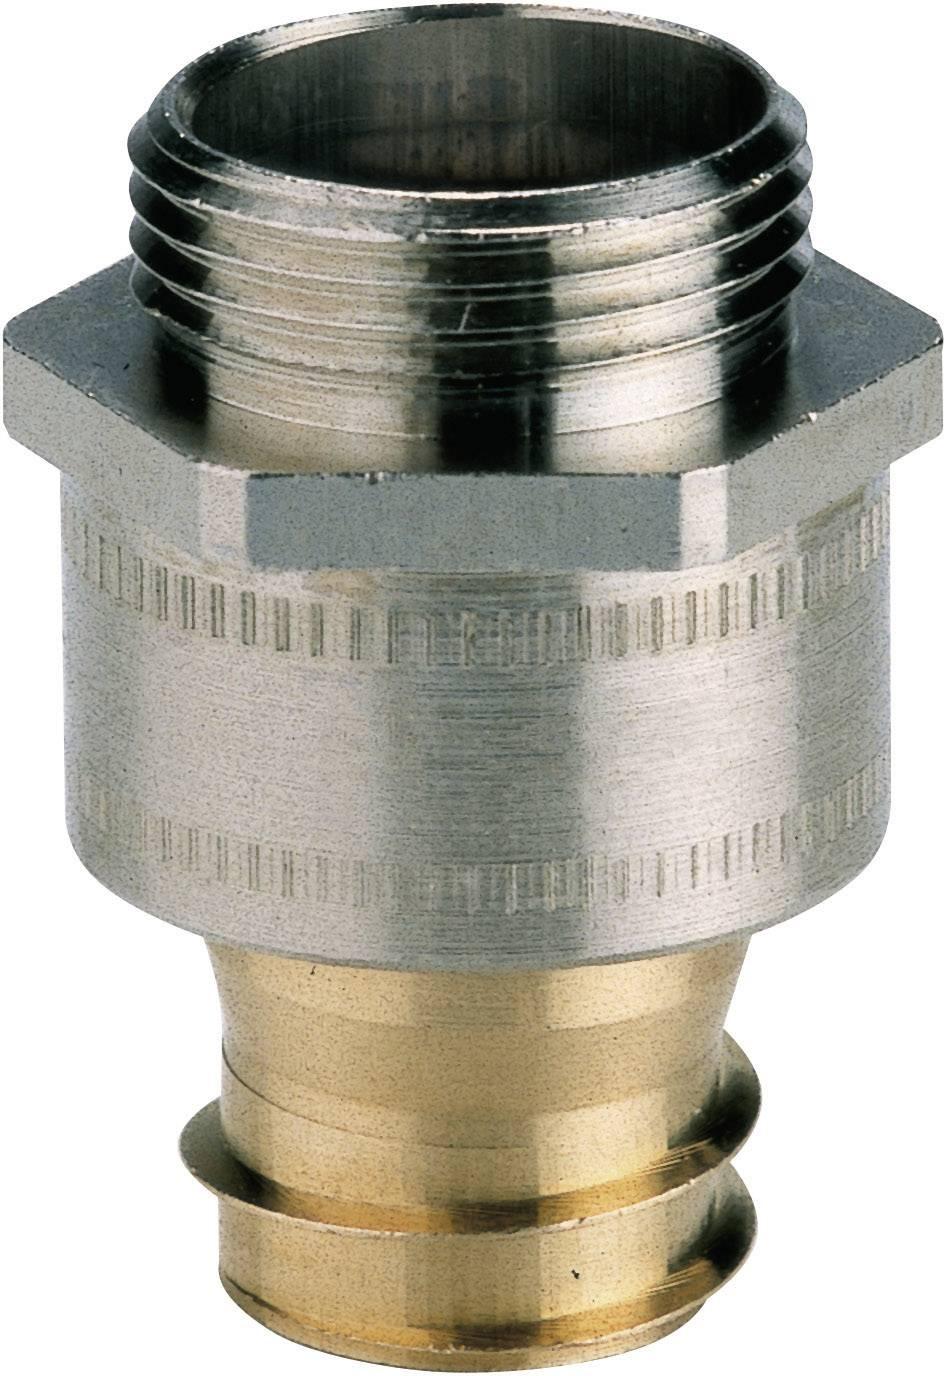 Šroubový spoj kovový LappKabel SILVYN LI-M 25x1,5 SGY (61802373)